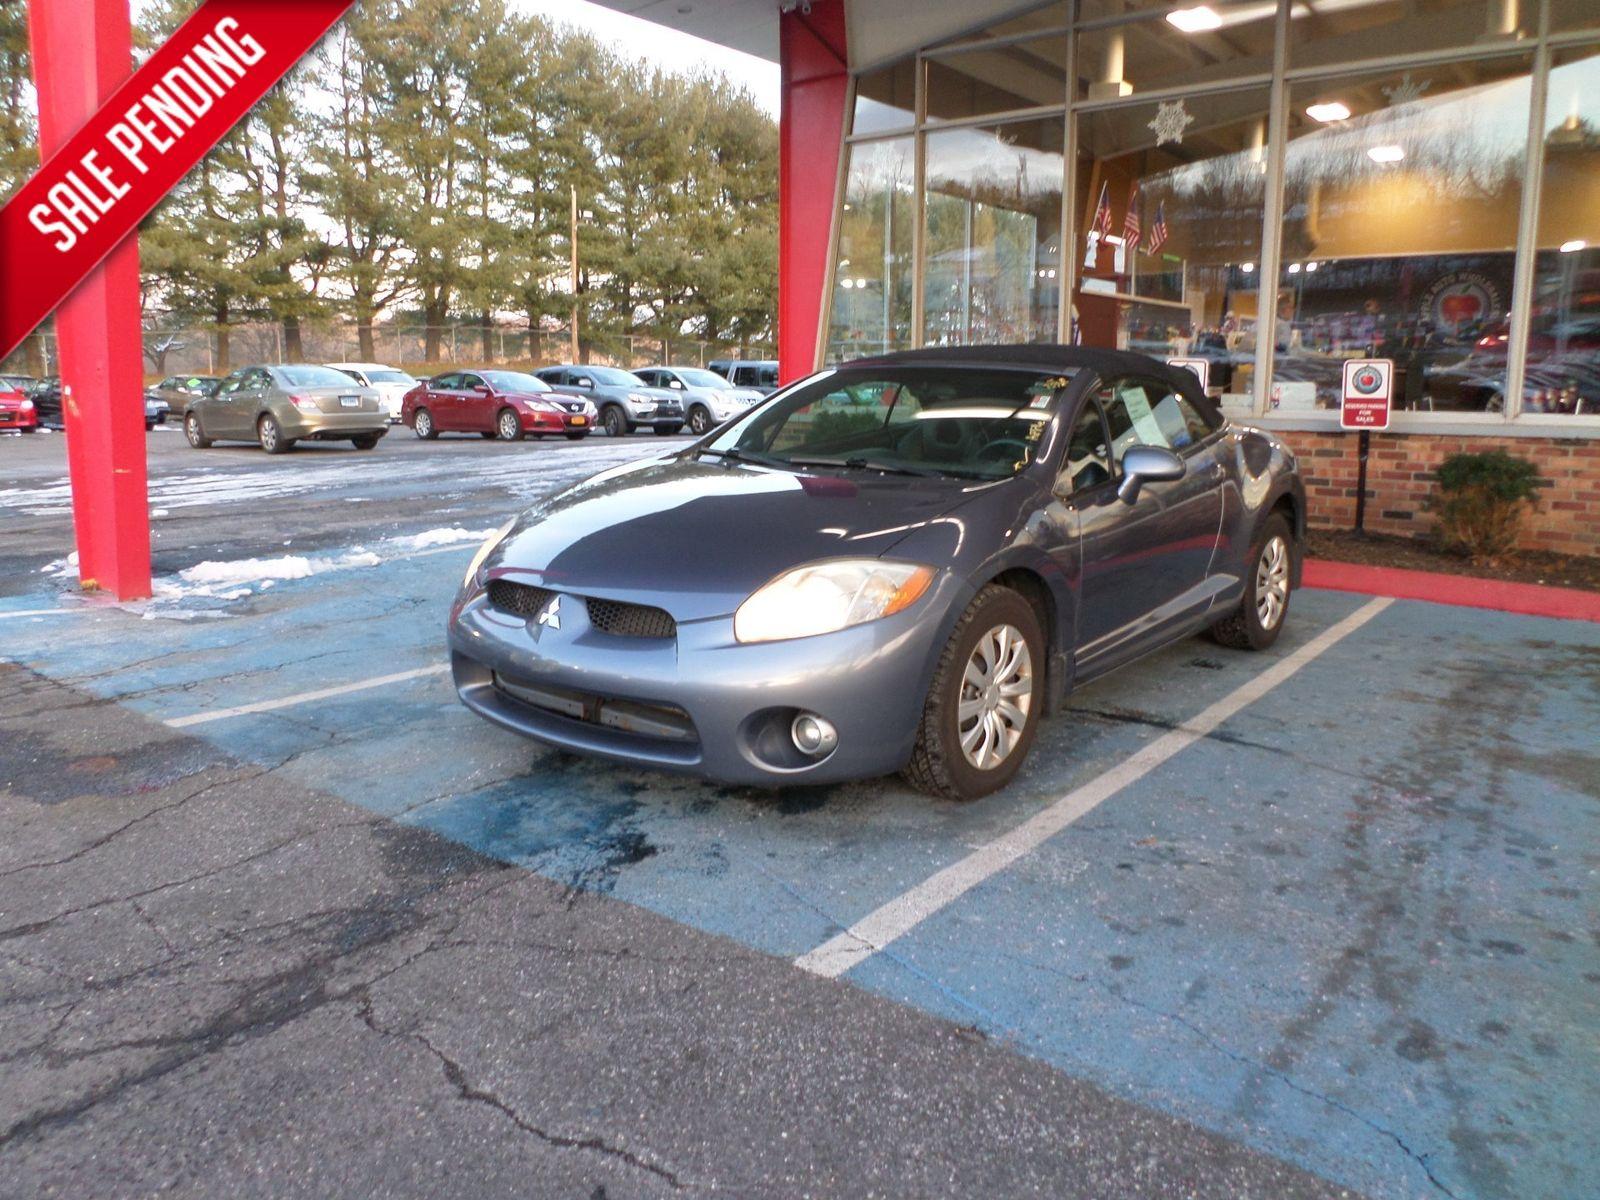 2008 Mitsubishi Eclipse GS City CT Apple Auto Wholesales In WATERBURY, ...